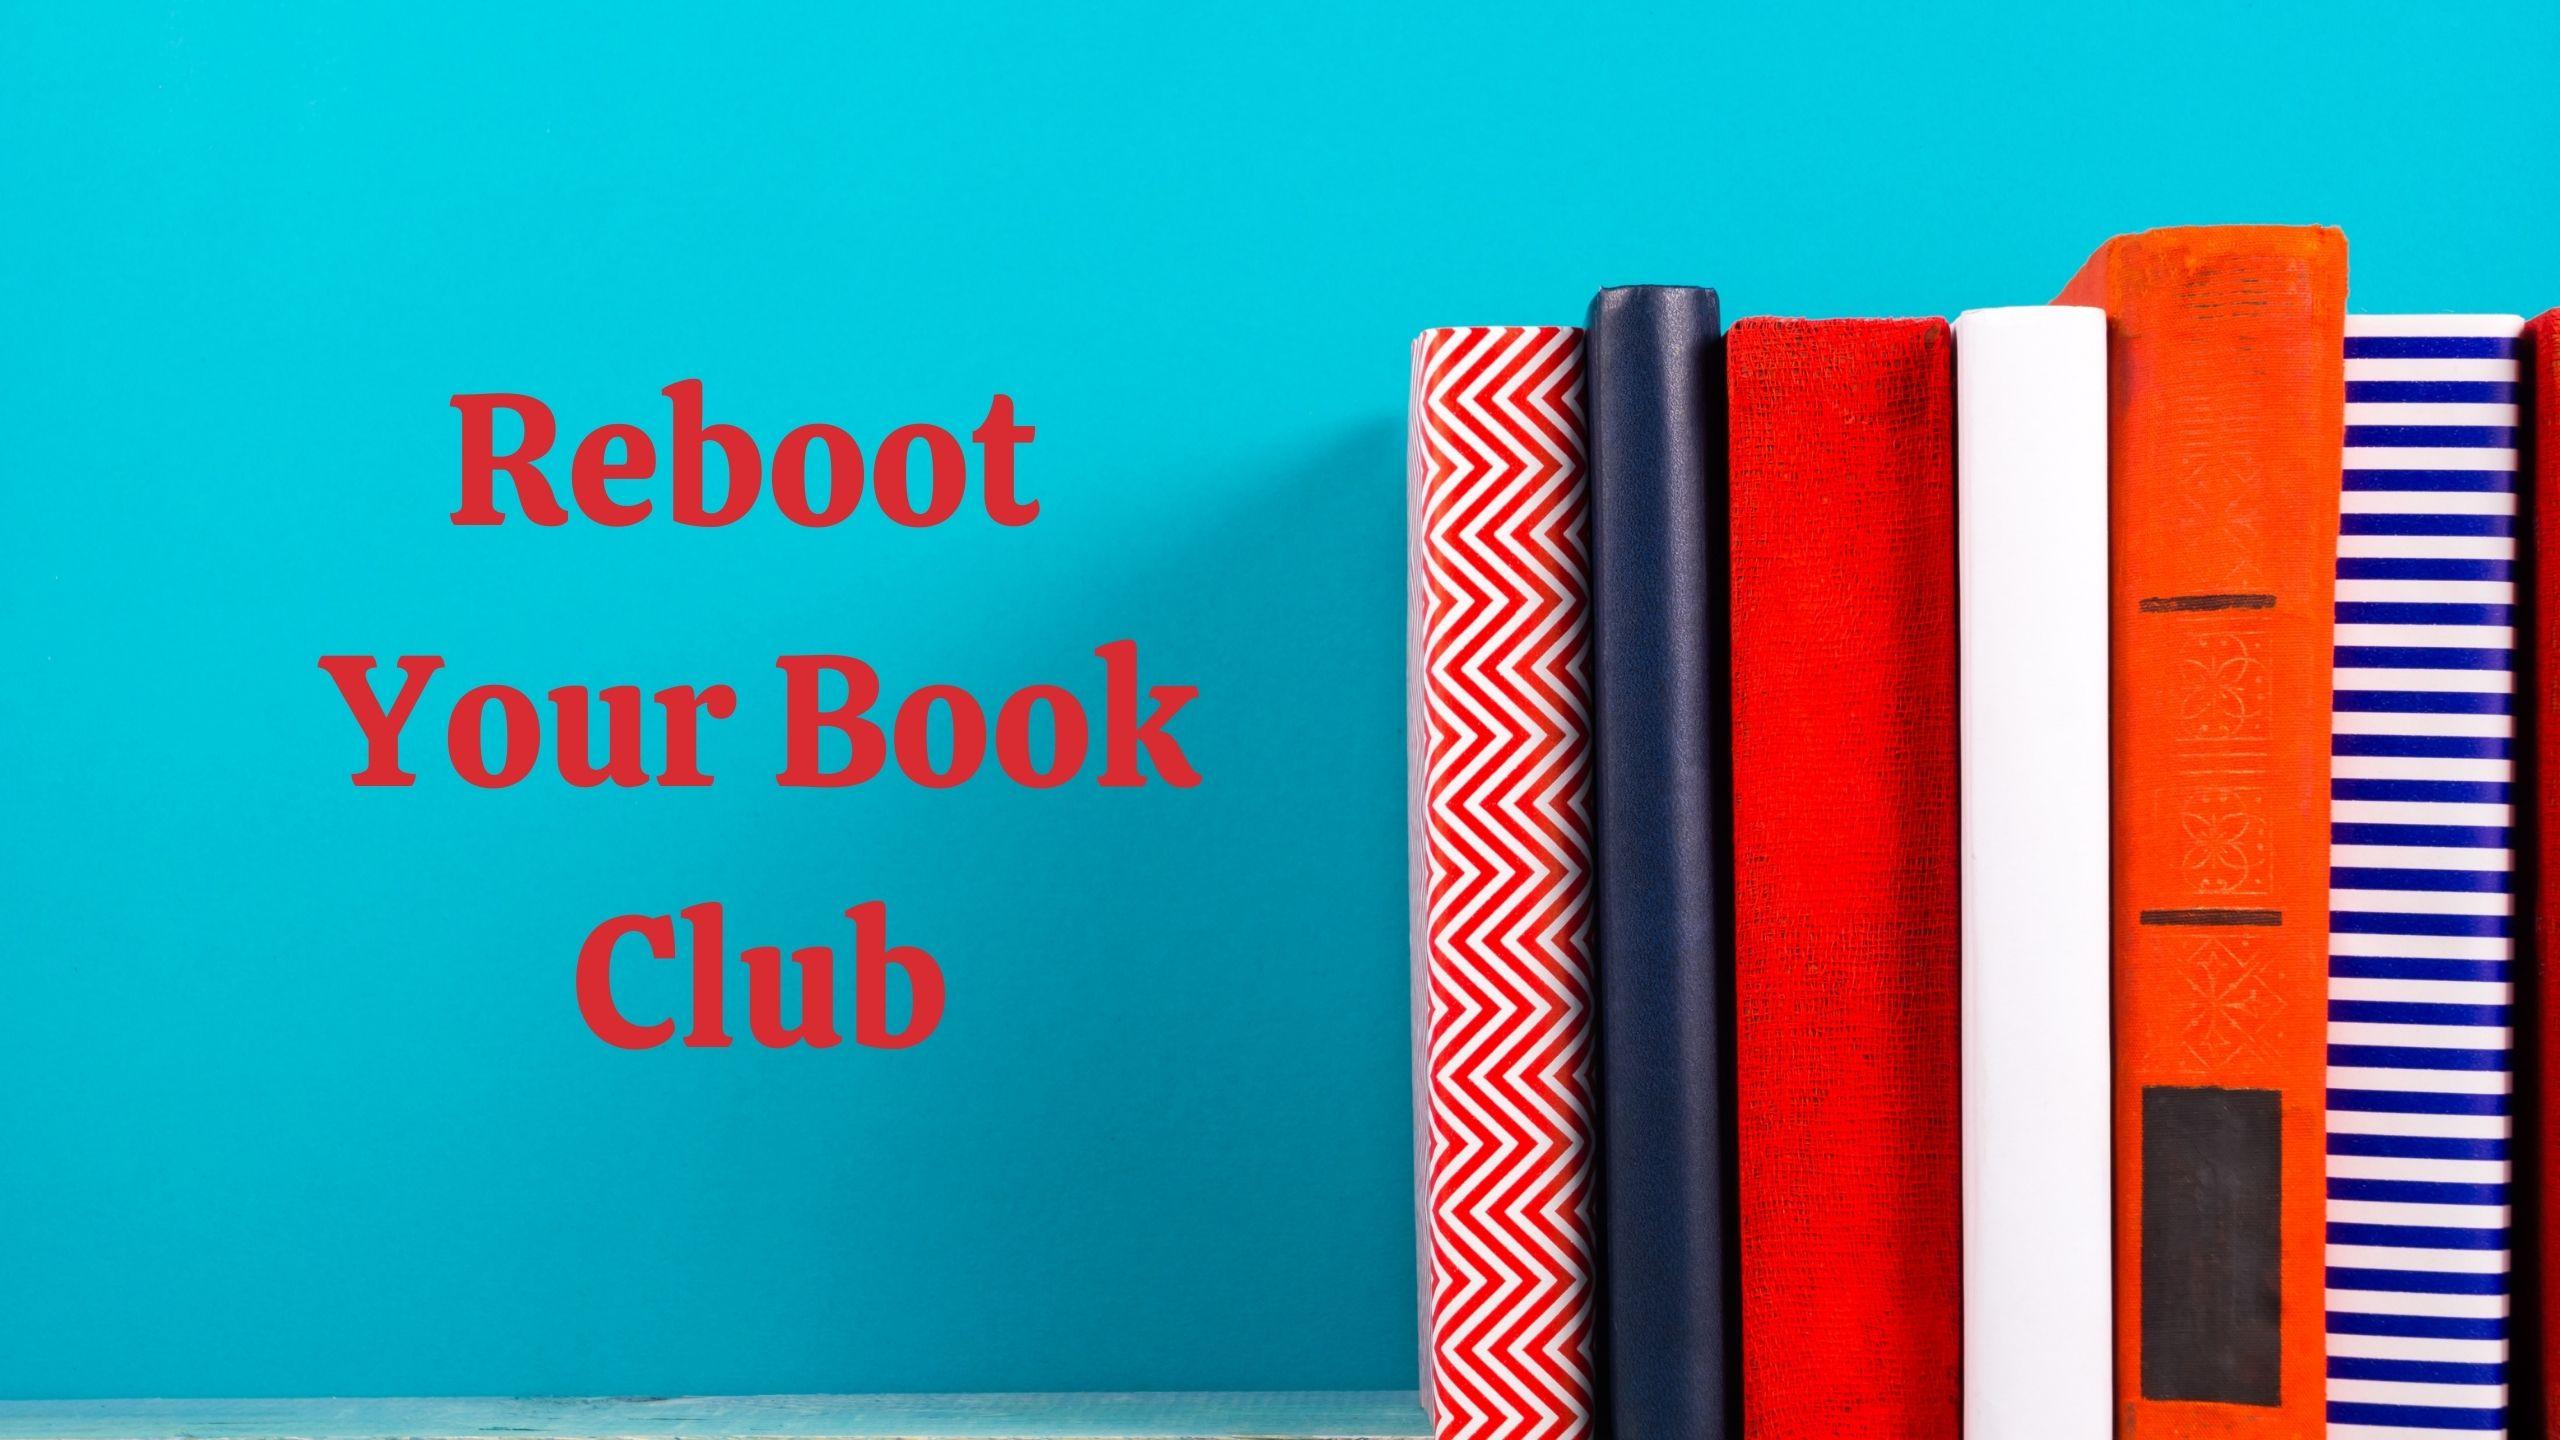 Rebook Your Book Club